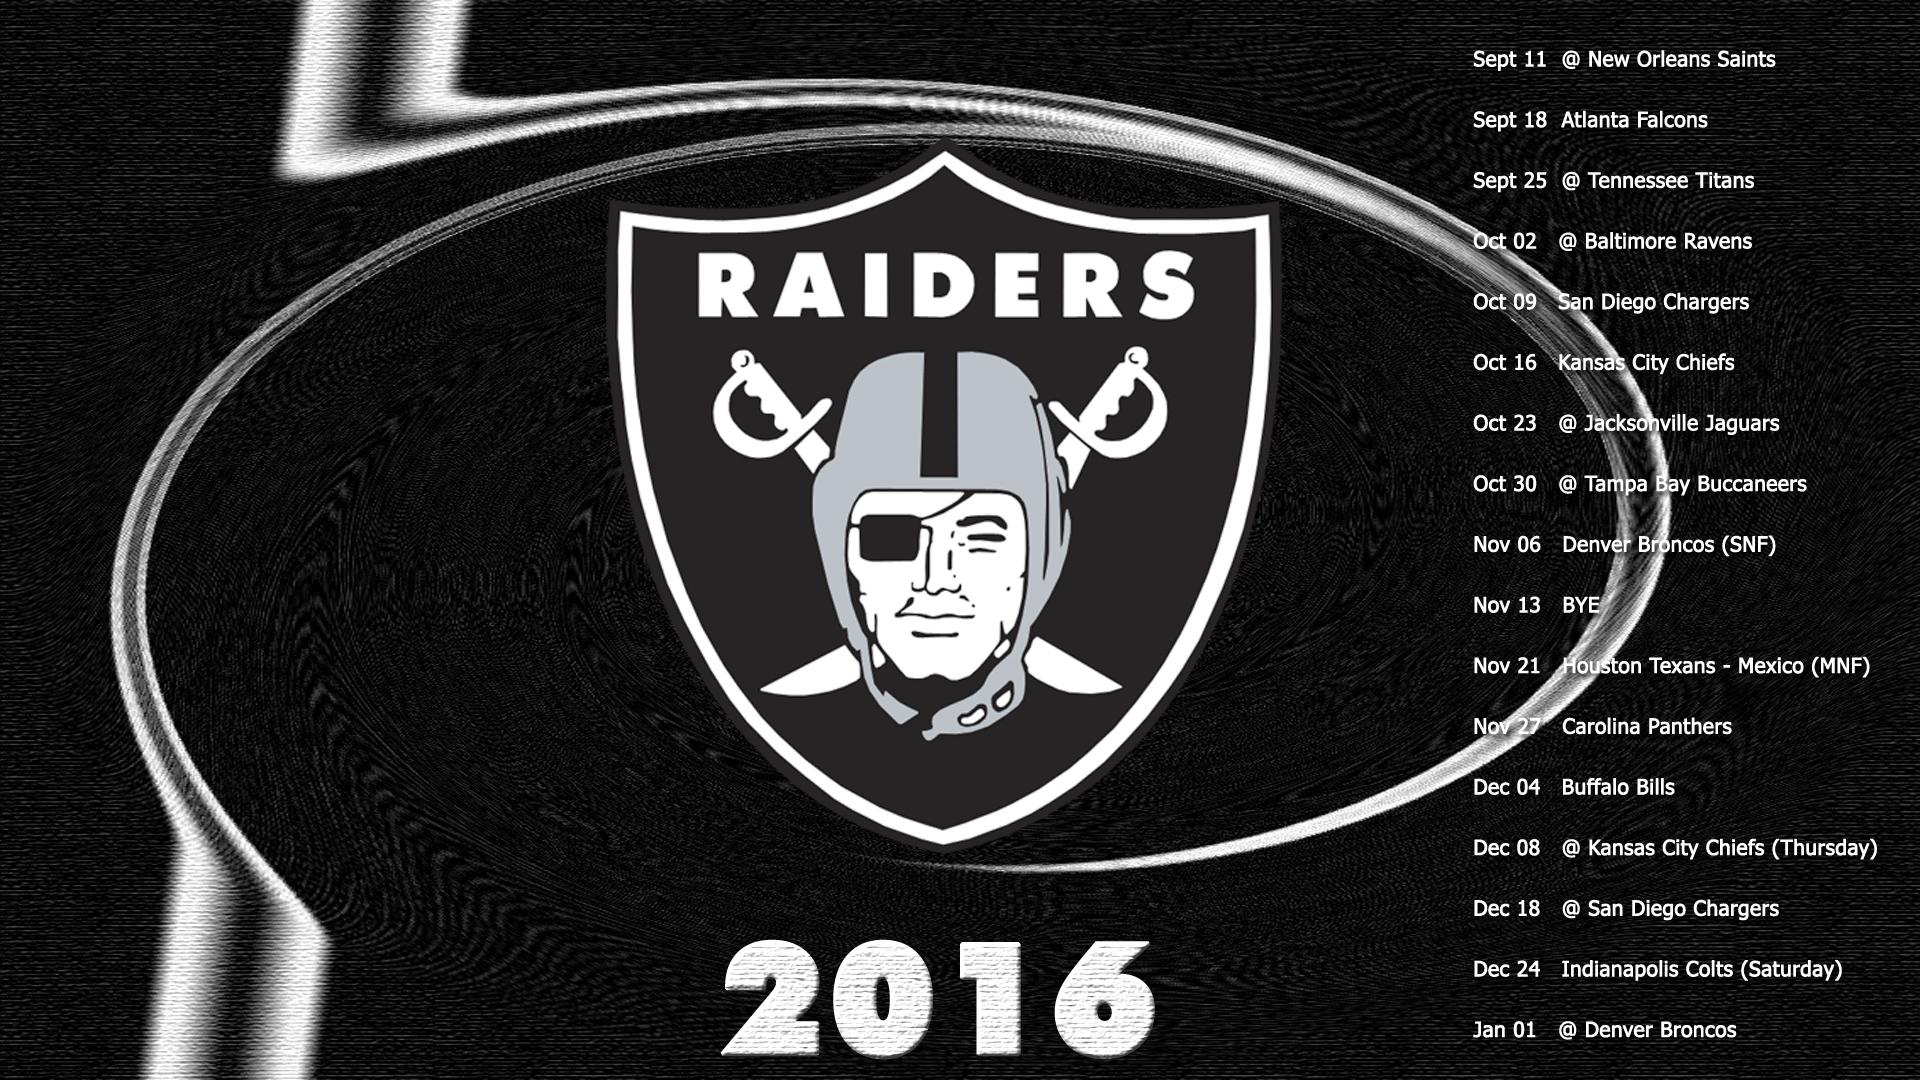 HD Raiders Wallpapers PixelsTalk Best images about Raider Nation World Oakland raiders 1920x1080